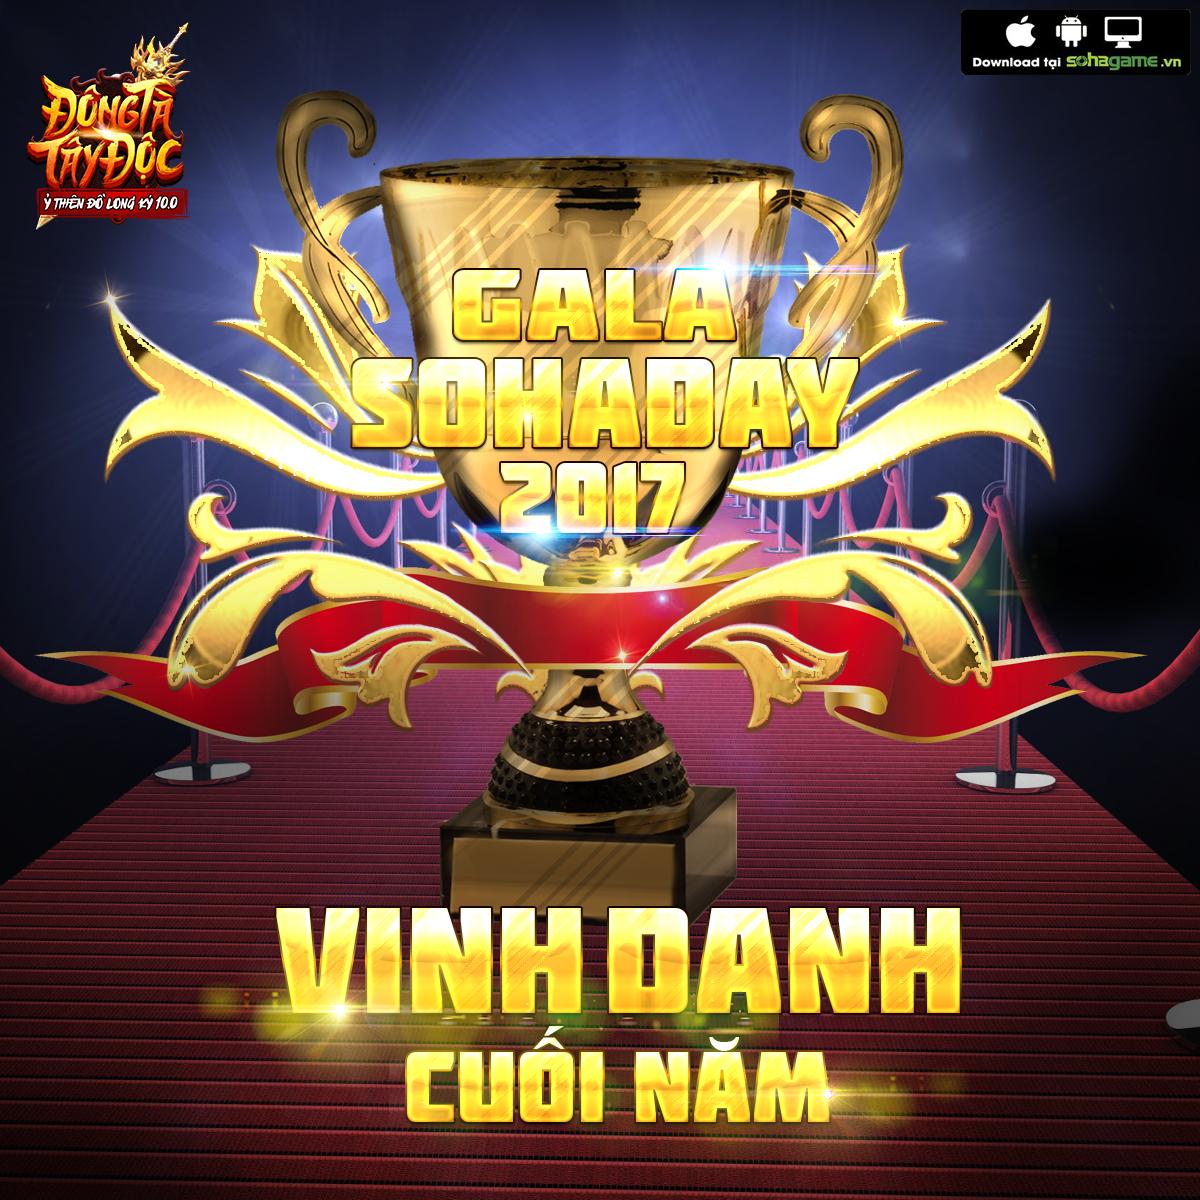 gala-sohagame-2017-vinh-danh-cuoi-nam